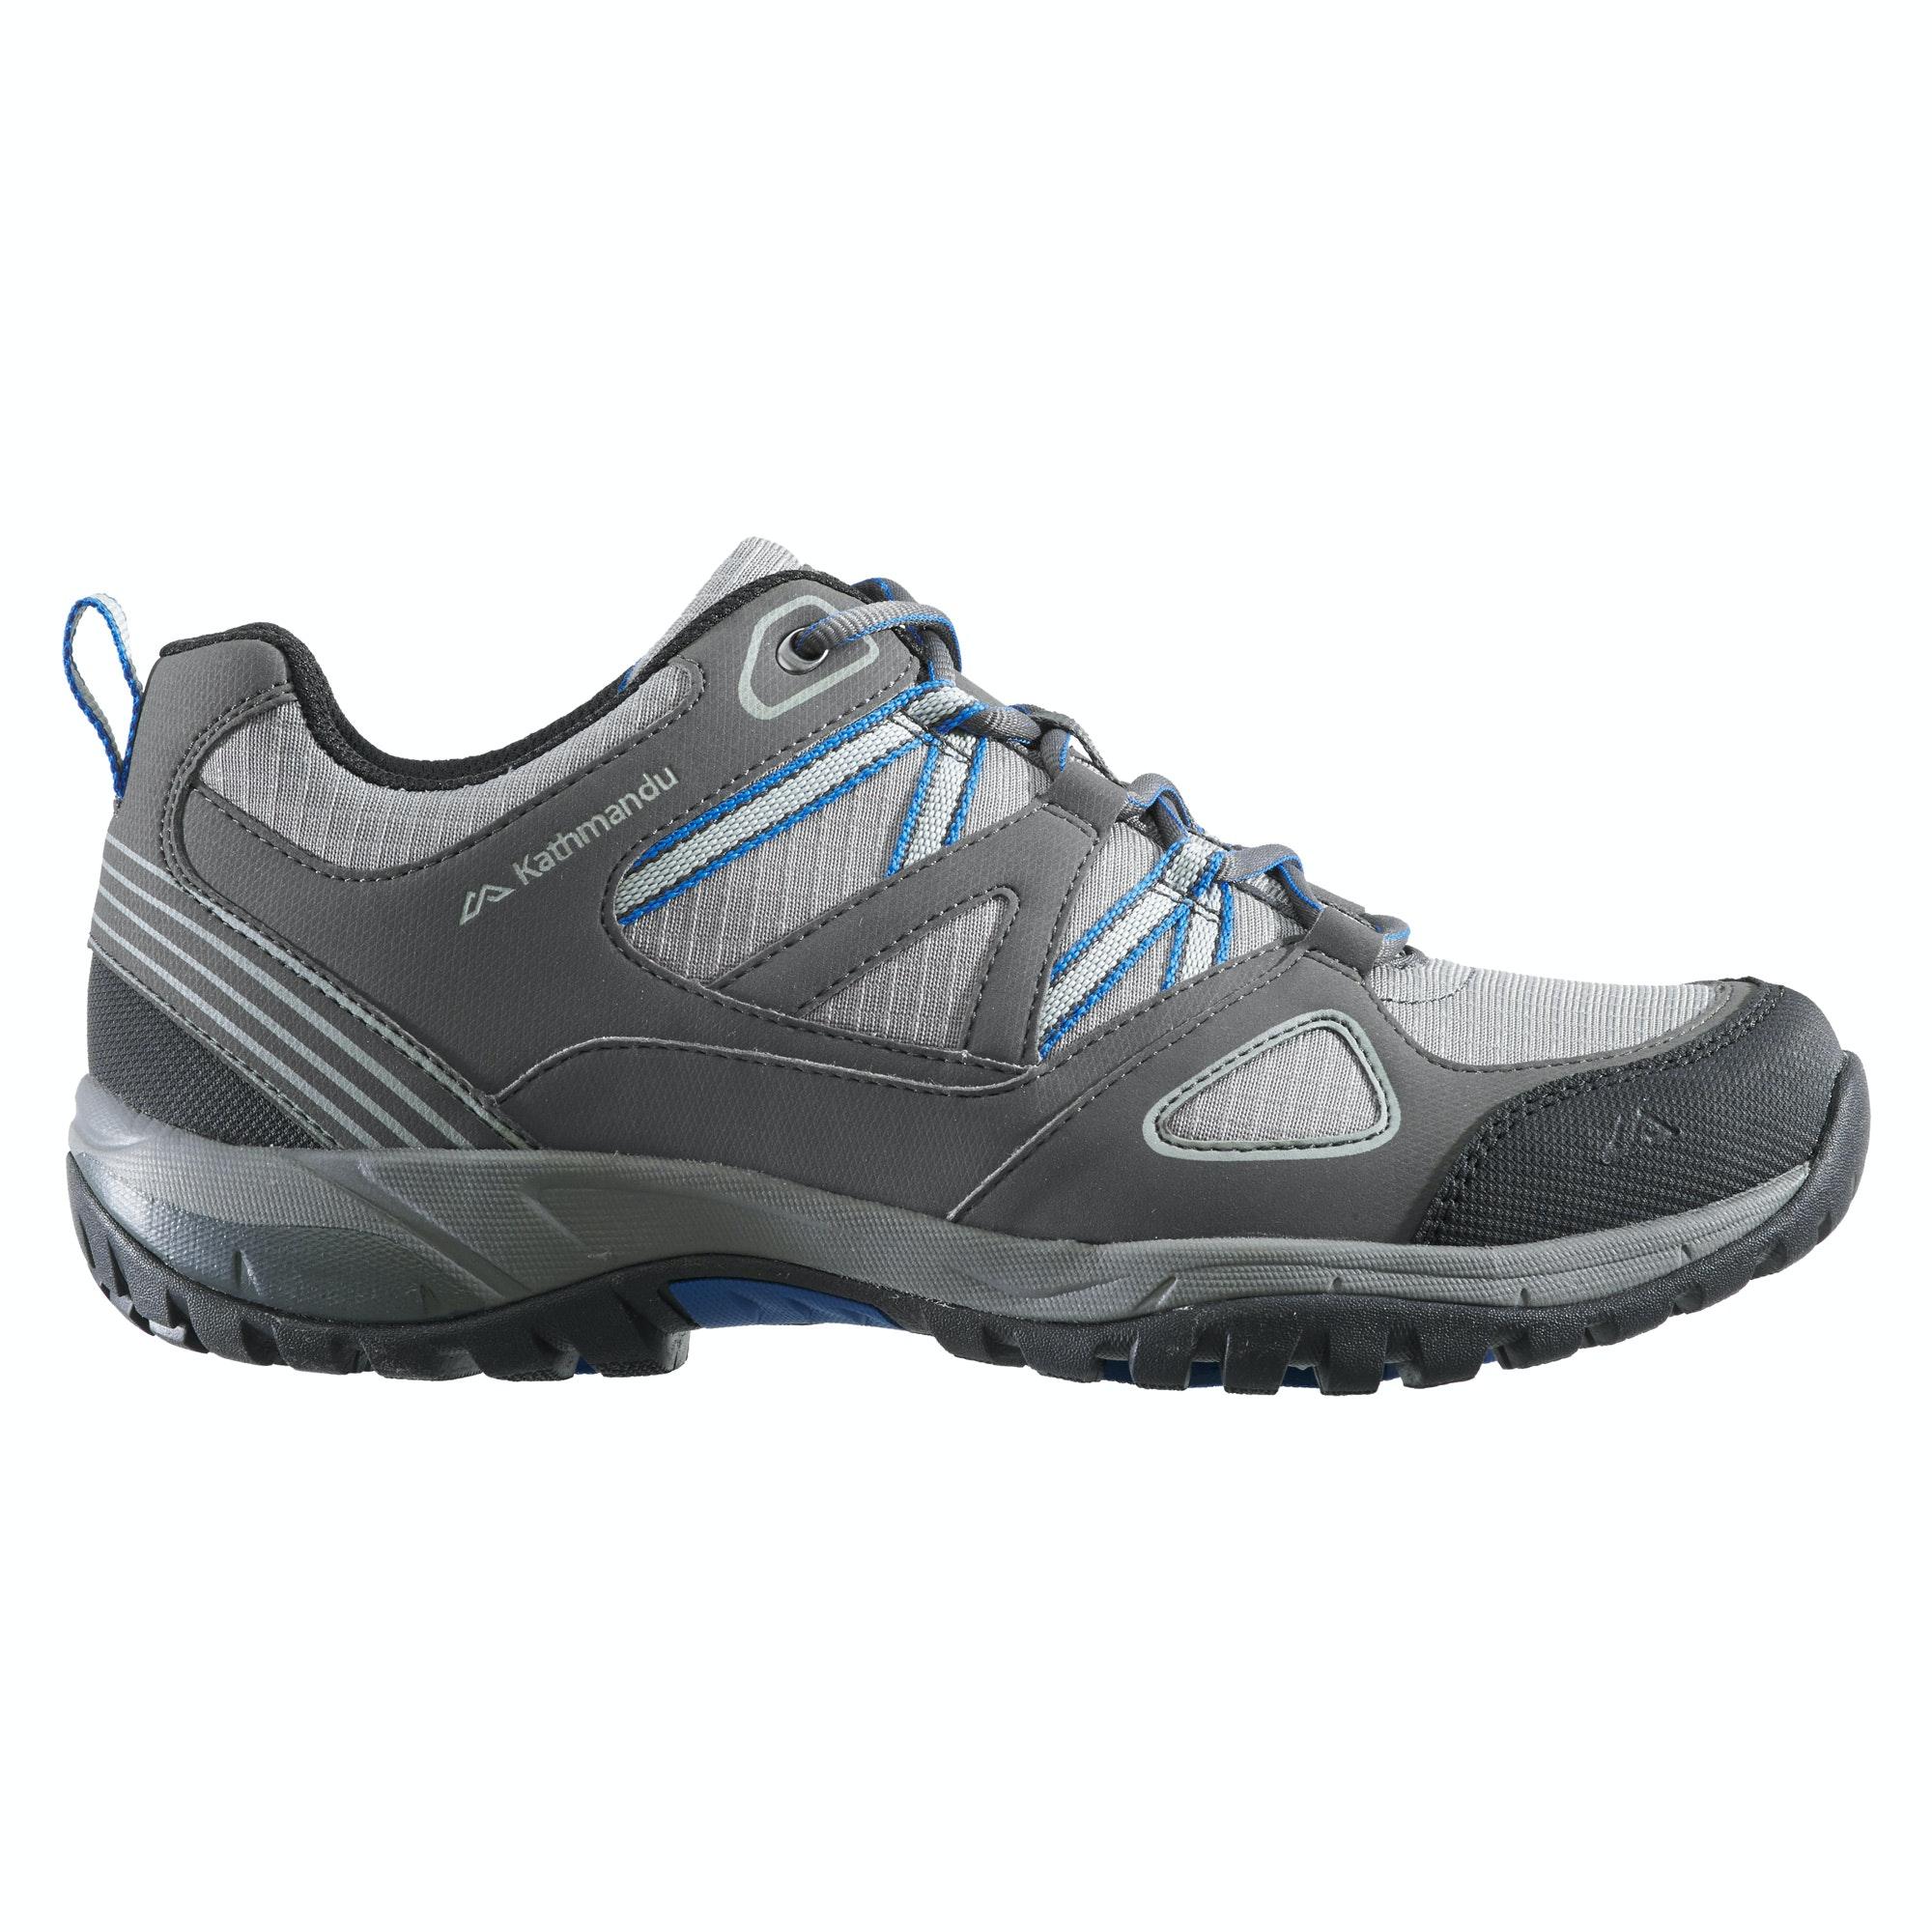 NEW-Kathmandu-Serpentine-II-Men-039-s-Lighweight-Durable-Hiking-Walking-Shoes